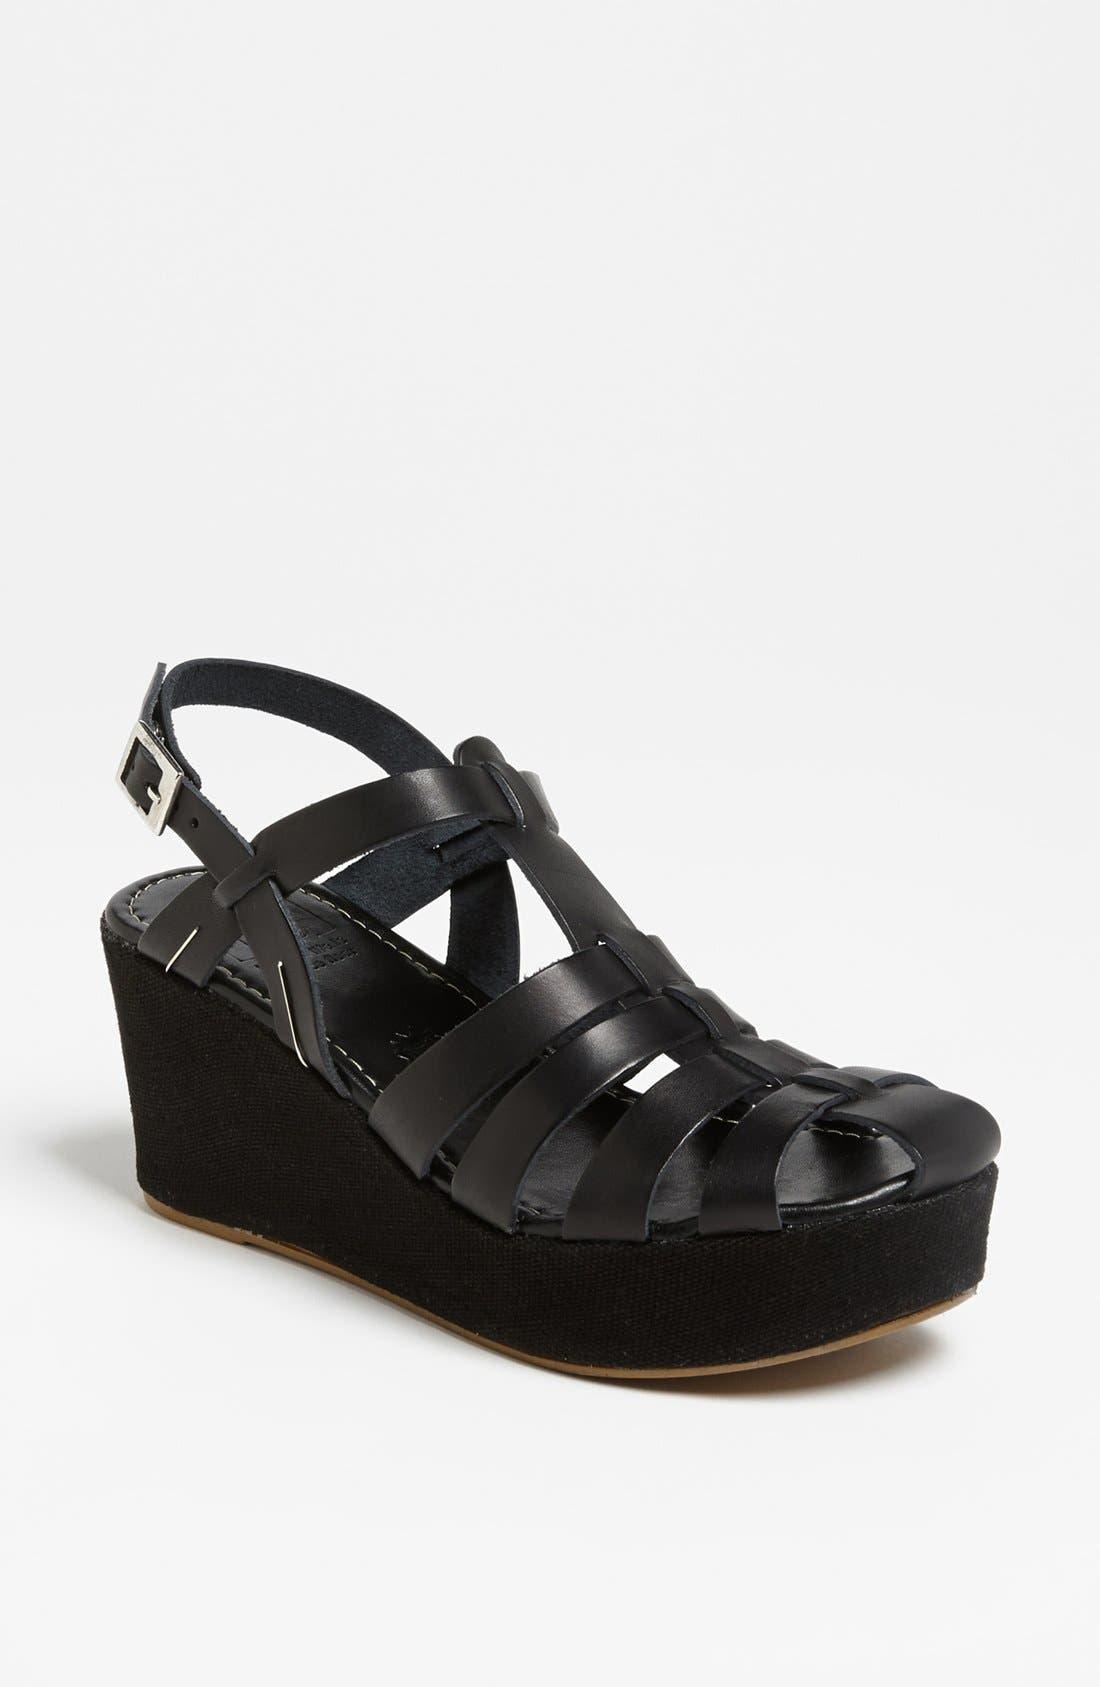 Main Image - BC Footwear 'Next in Line' Sandal